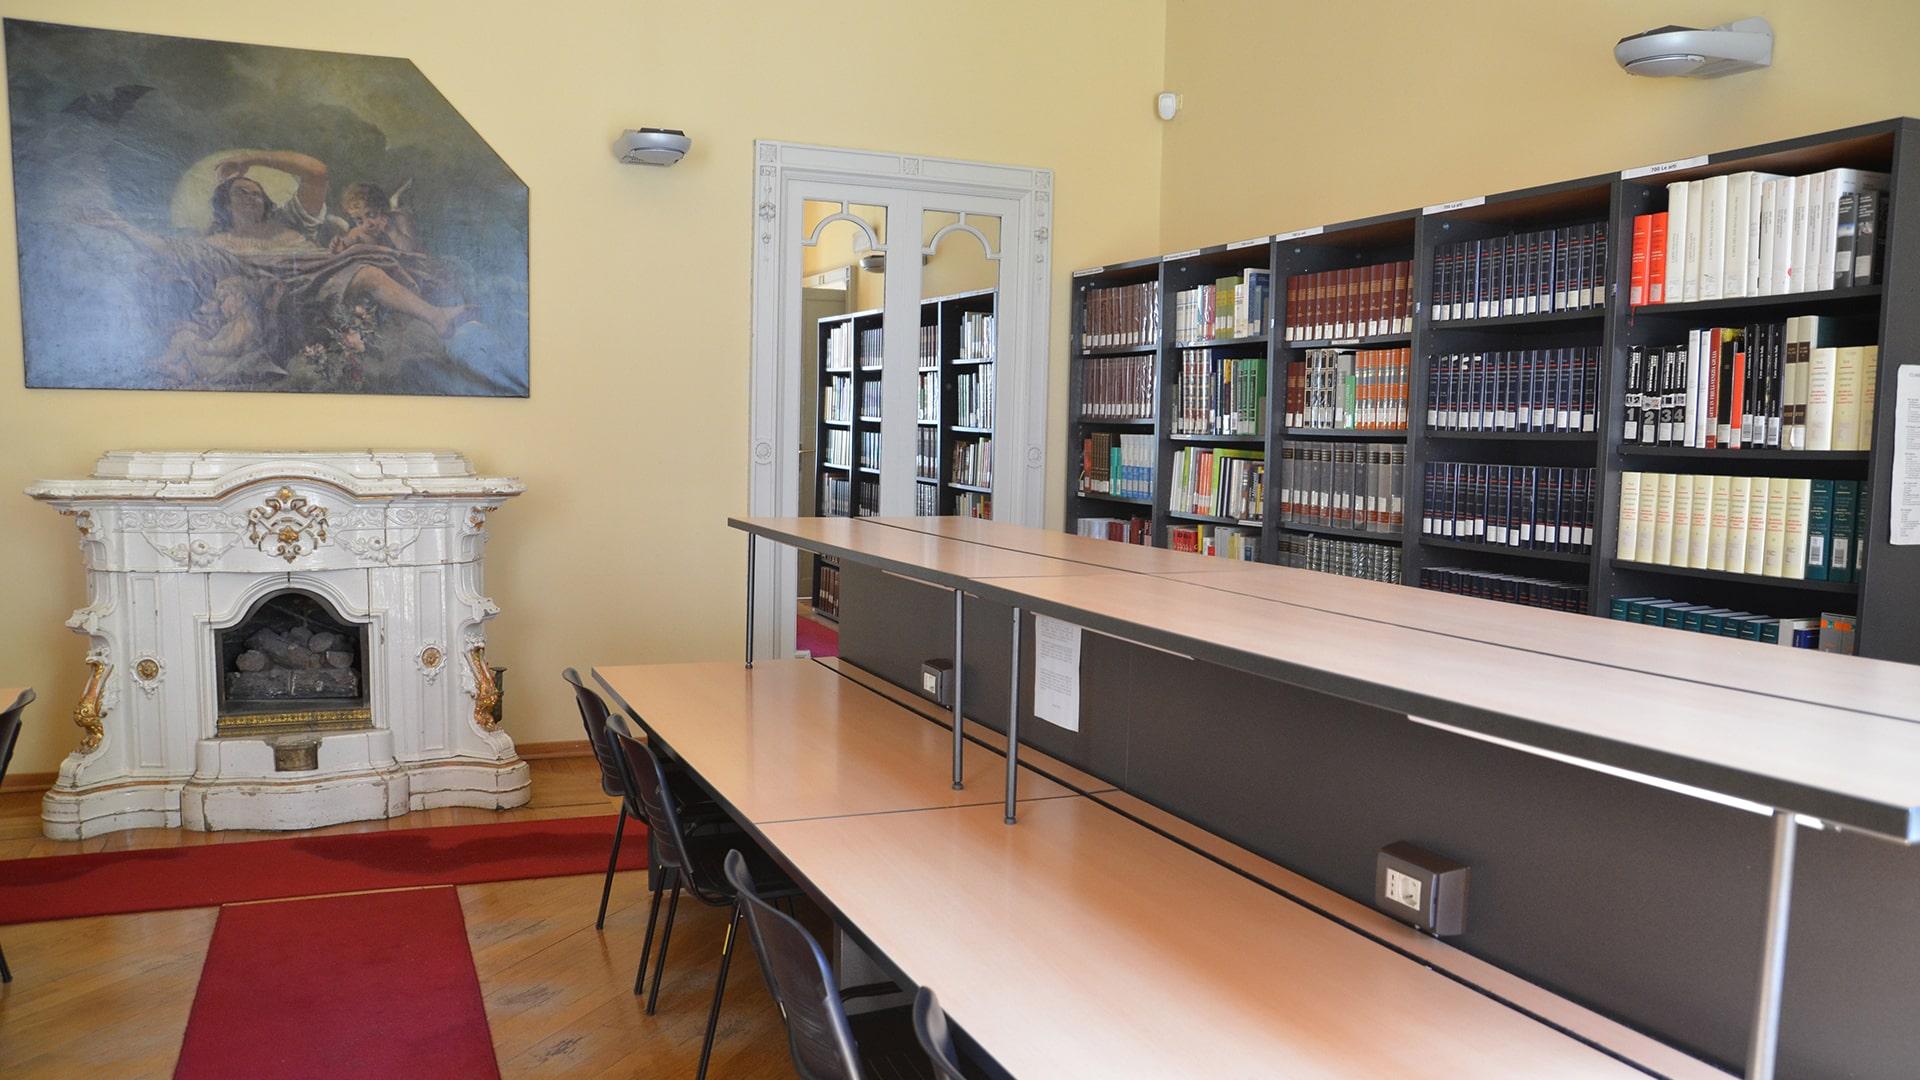 Biblioteca statale Stelio Crise